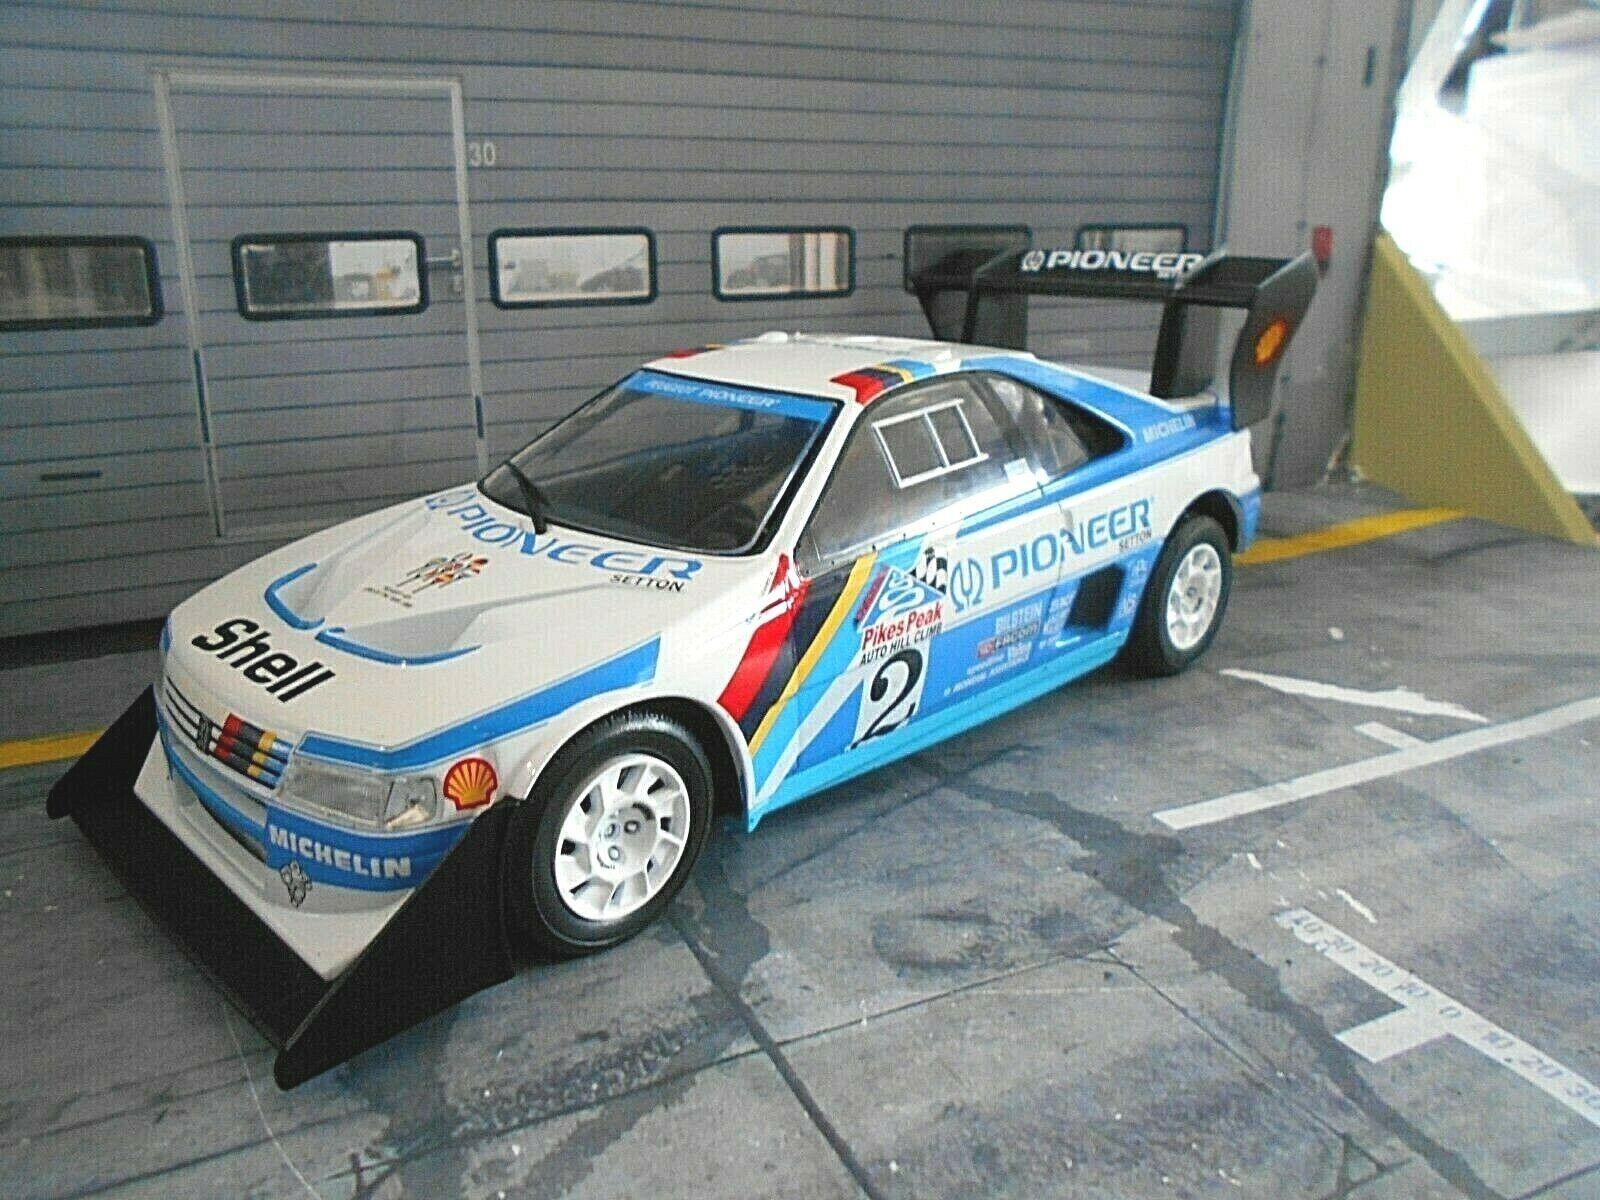 PEUGEOT 405 t16 Pikes Peak Race Winner  2 Vatanen PIONEER 1988 Winne ALTAYA 1 18